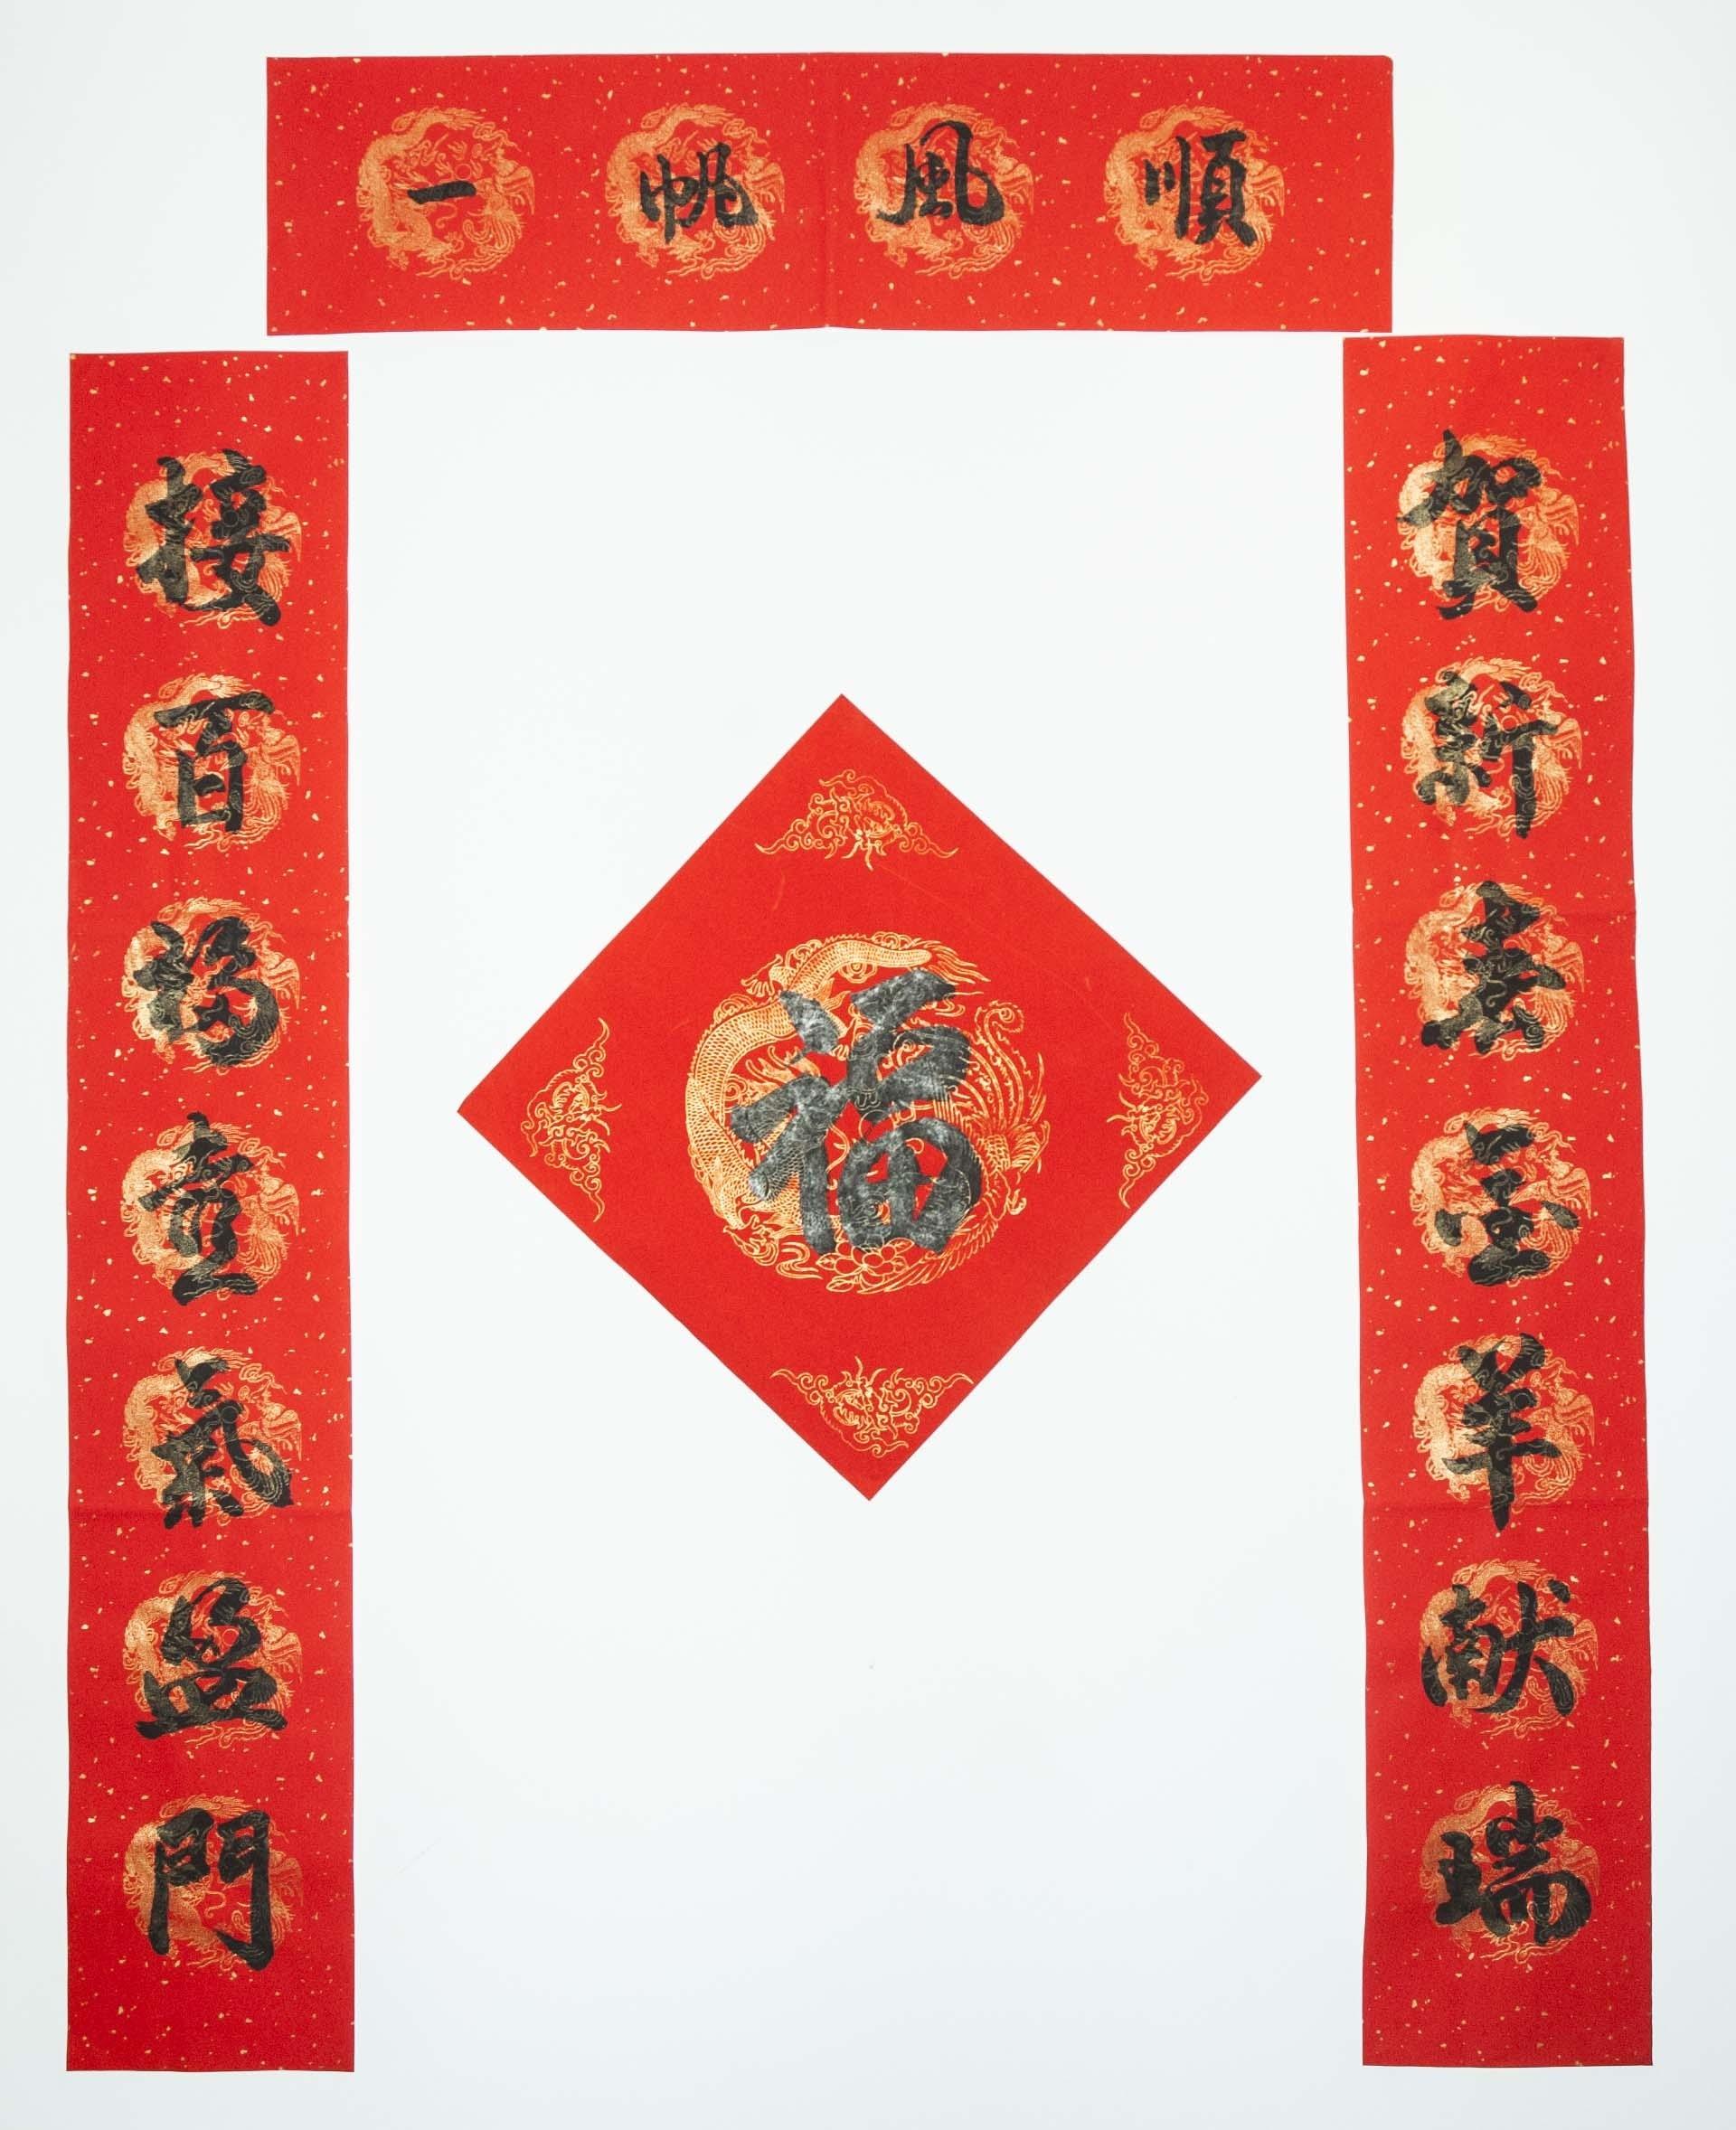 Qoo10 贺新春金羊献瑞 Chinese New Year Decoration Spring